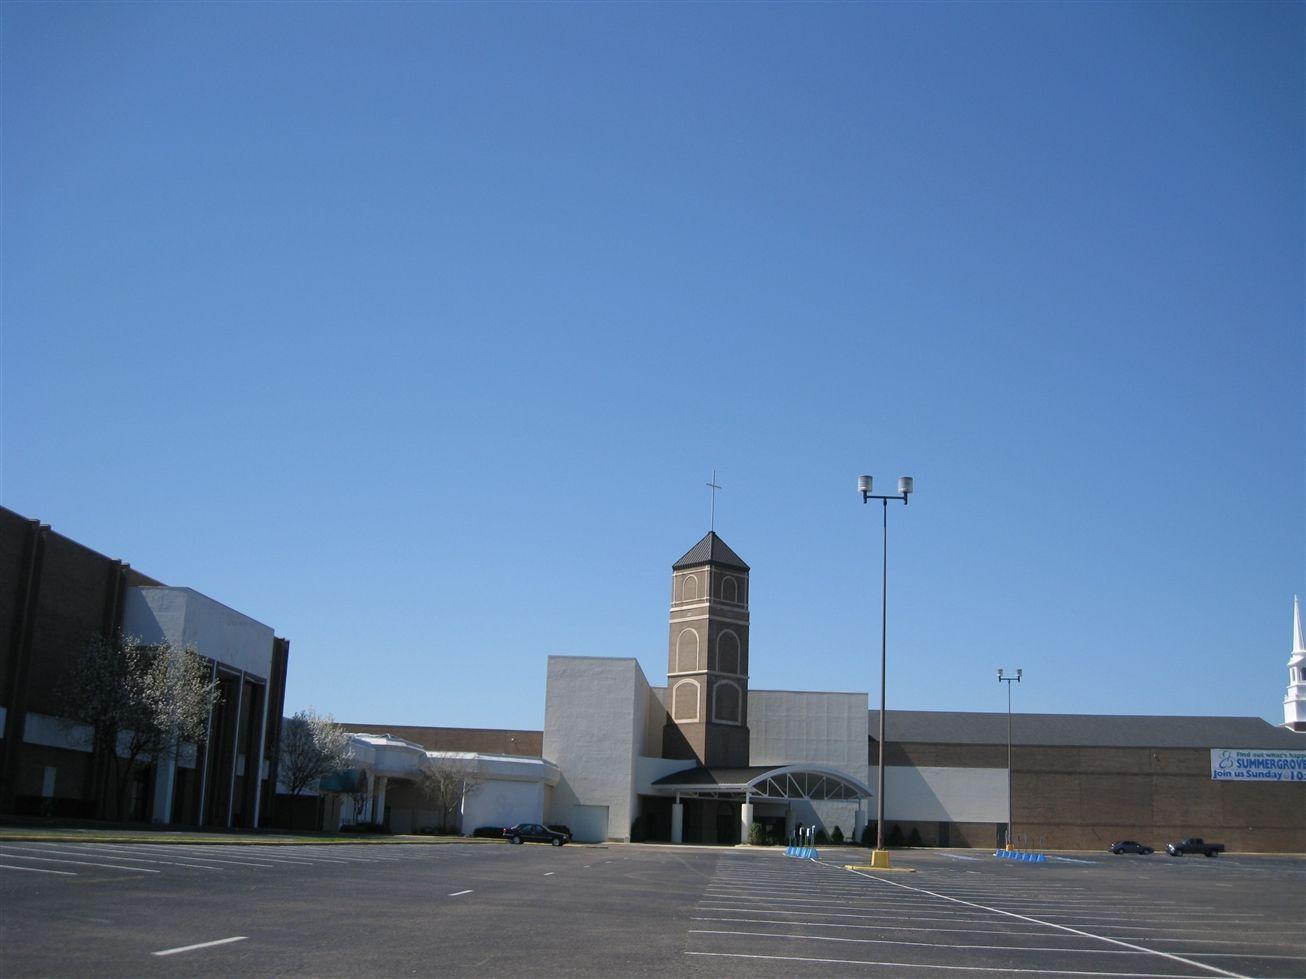 Commercial Building In Bossier City La South Park Mall Summer Grove Baptist Church Shreveport Louisiana Shreveport South Park Baptist Church